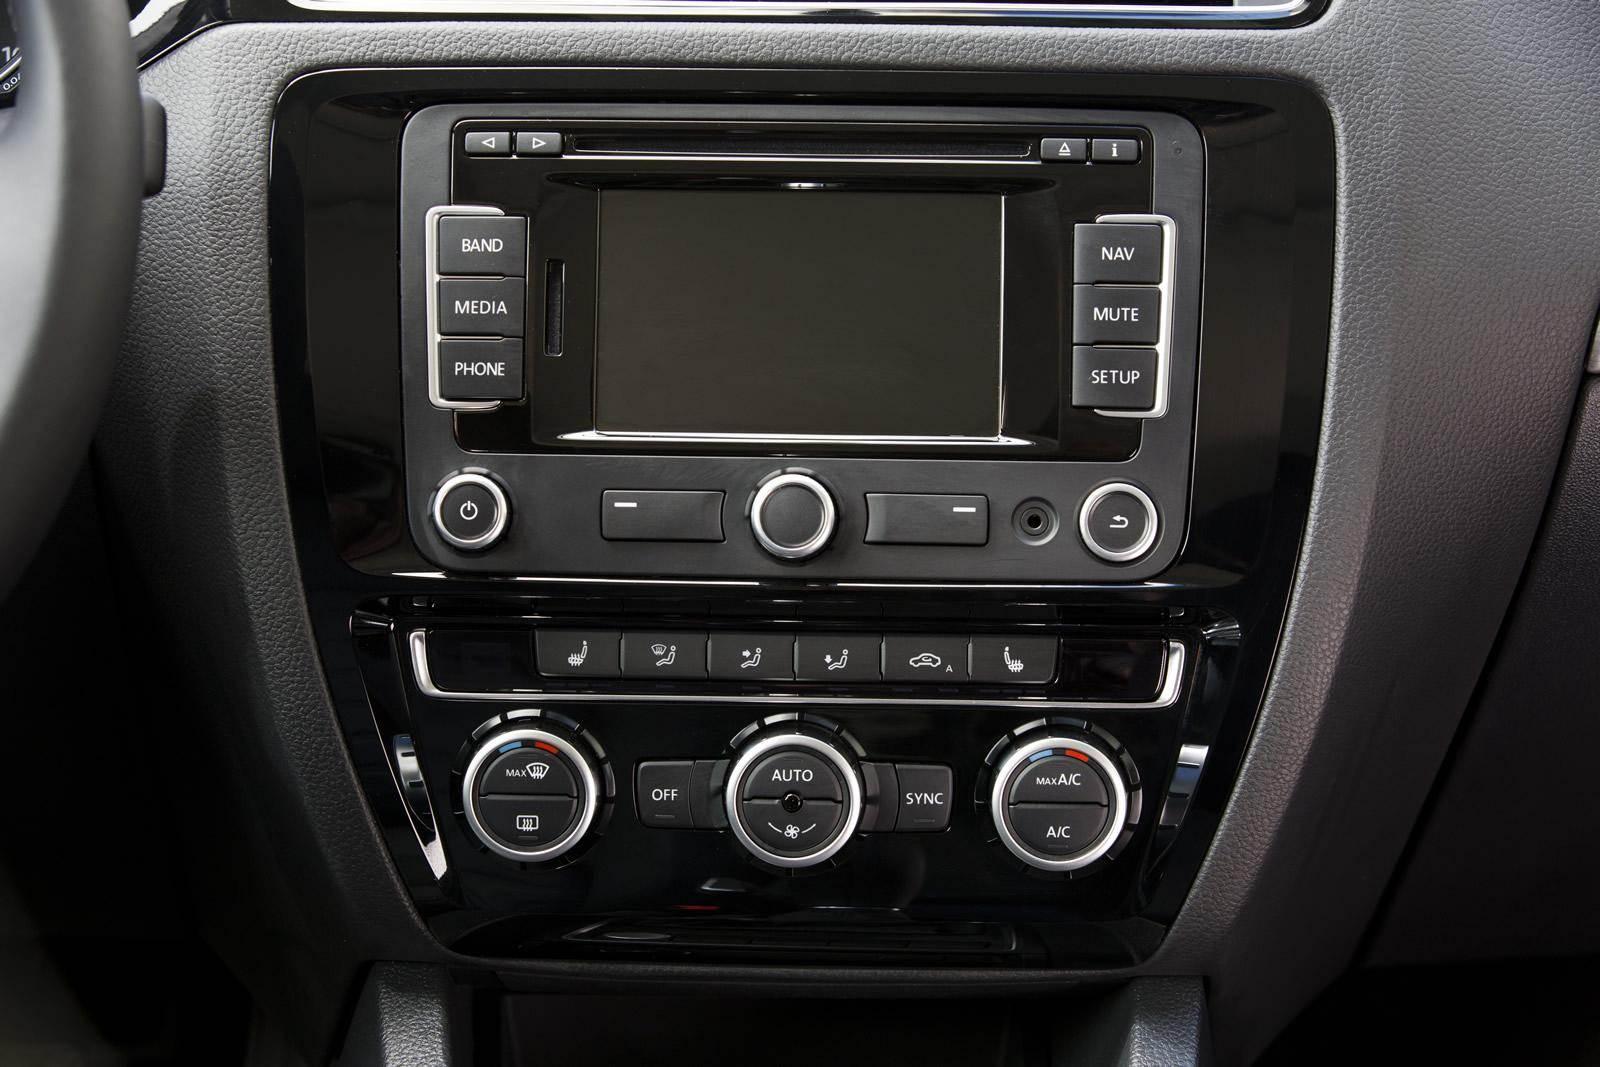 Novo Volkswagen Jetta 2015 - painel